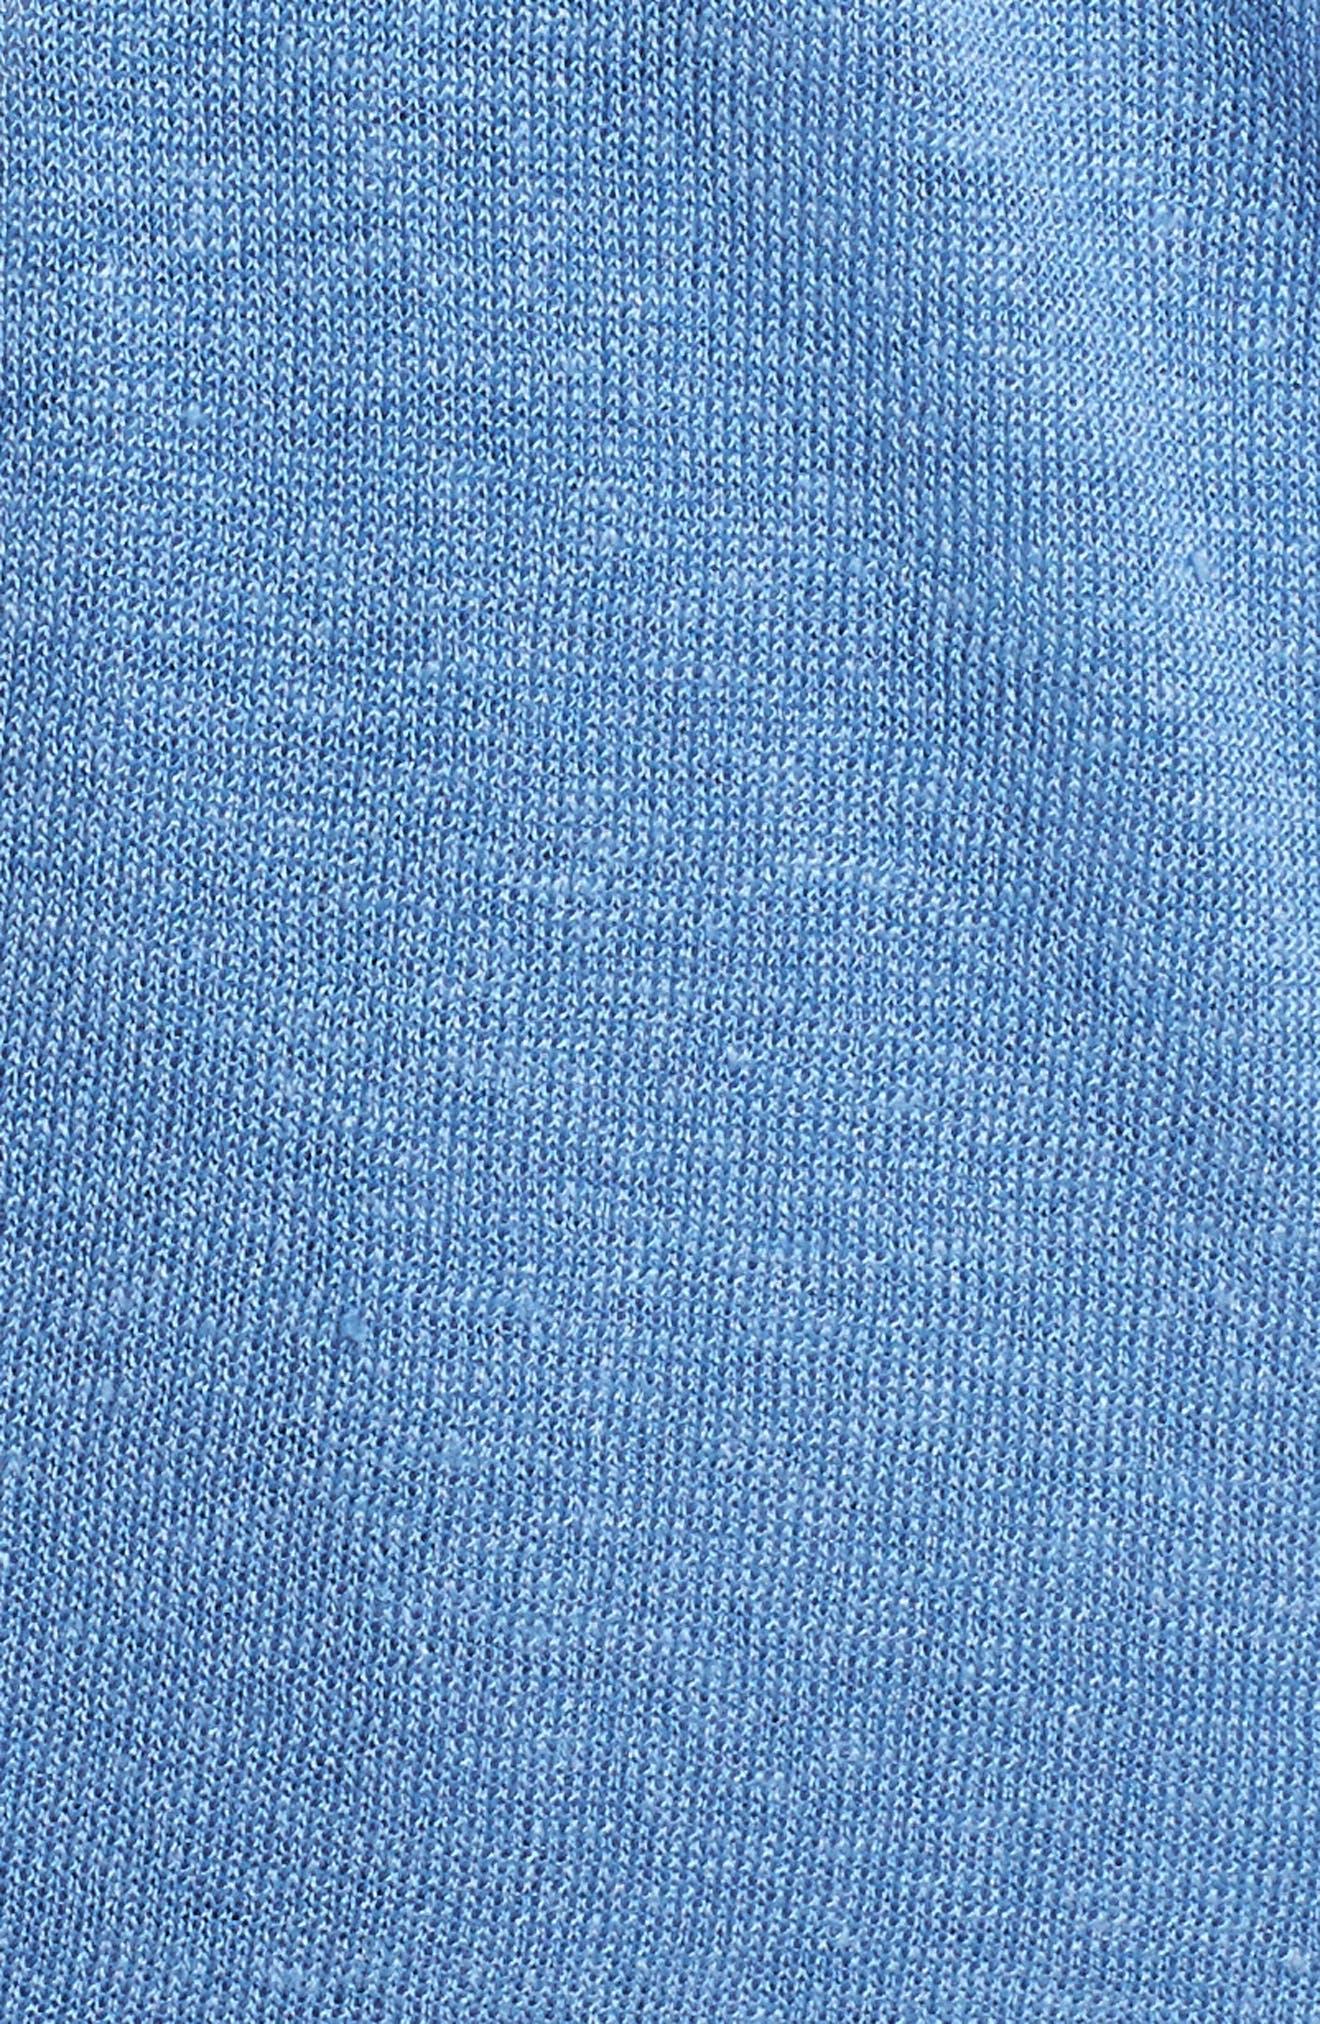 Four-Way Convertible Cardigan,                             Alternate thumbnail 5, color,                             BLUE HAZE